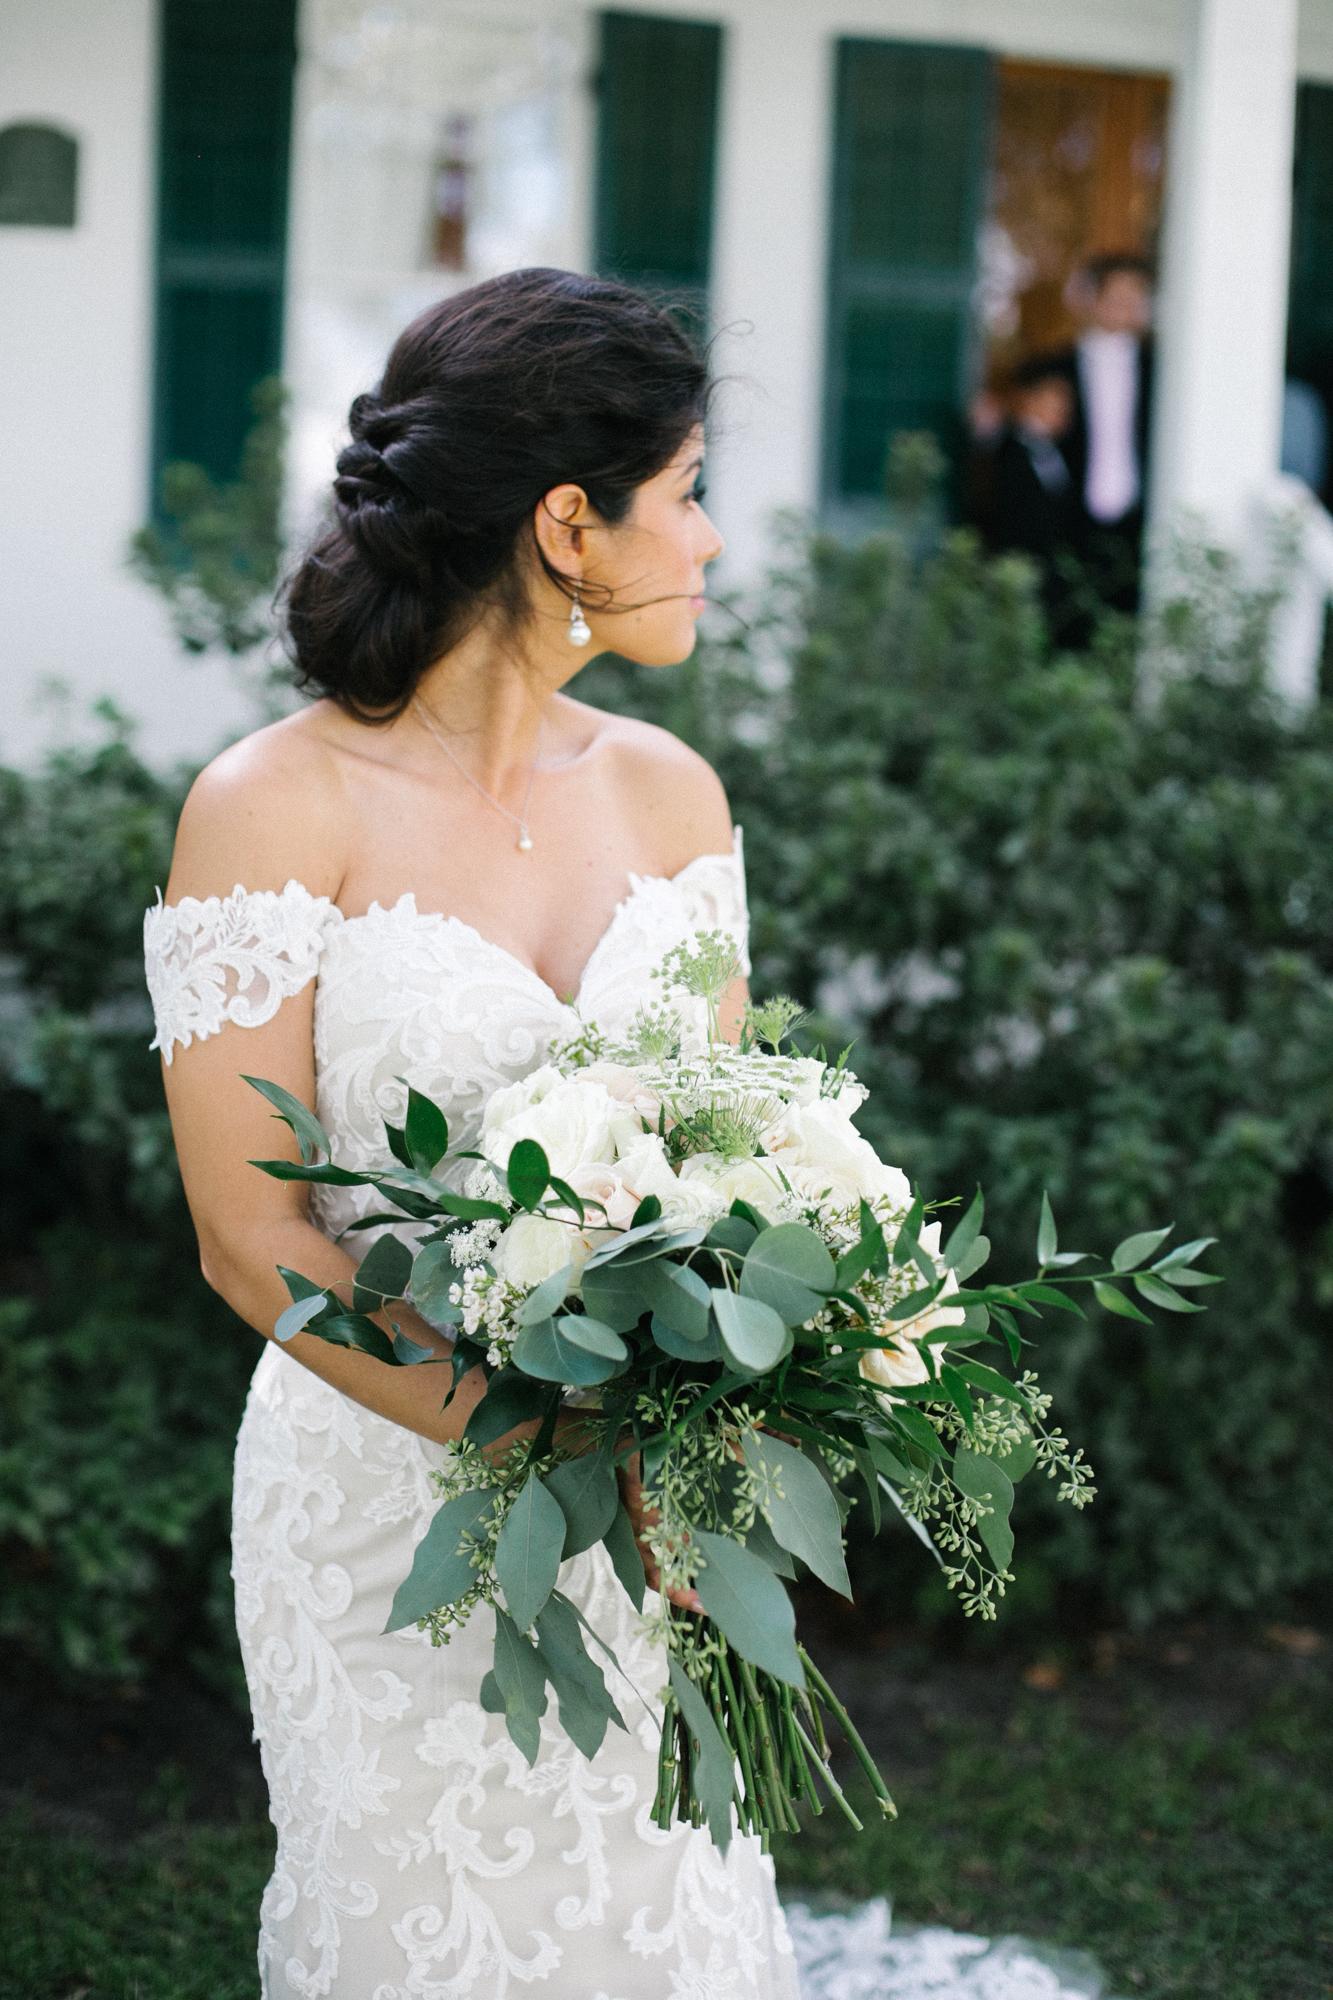 Gautier_Wedding_Photographer-64.jpg